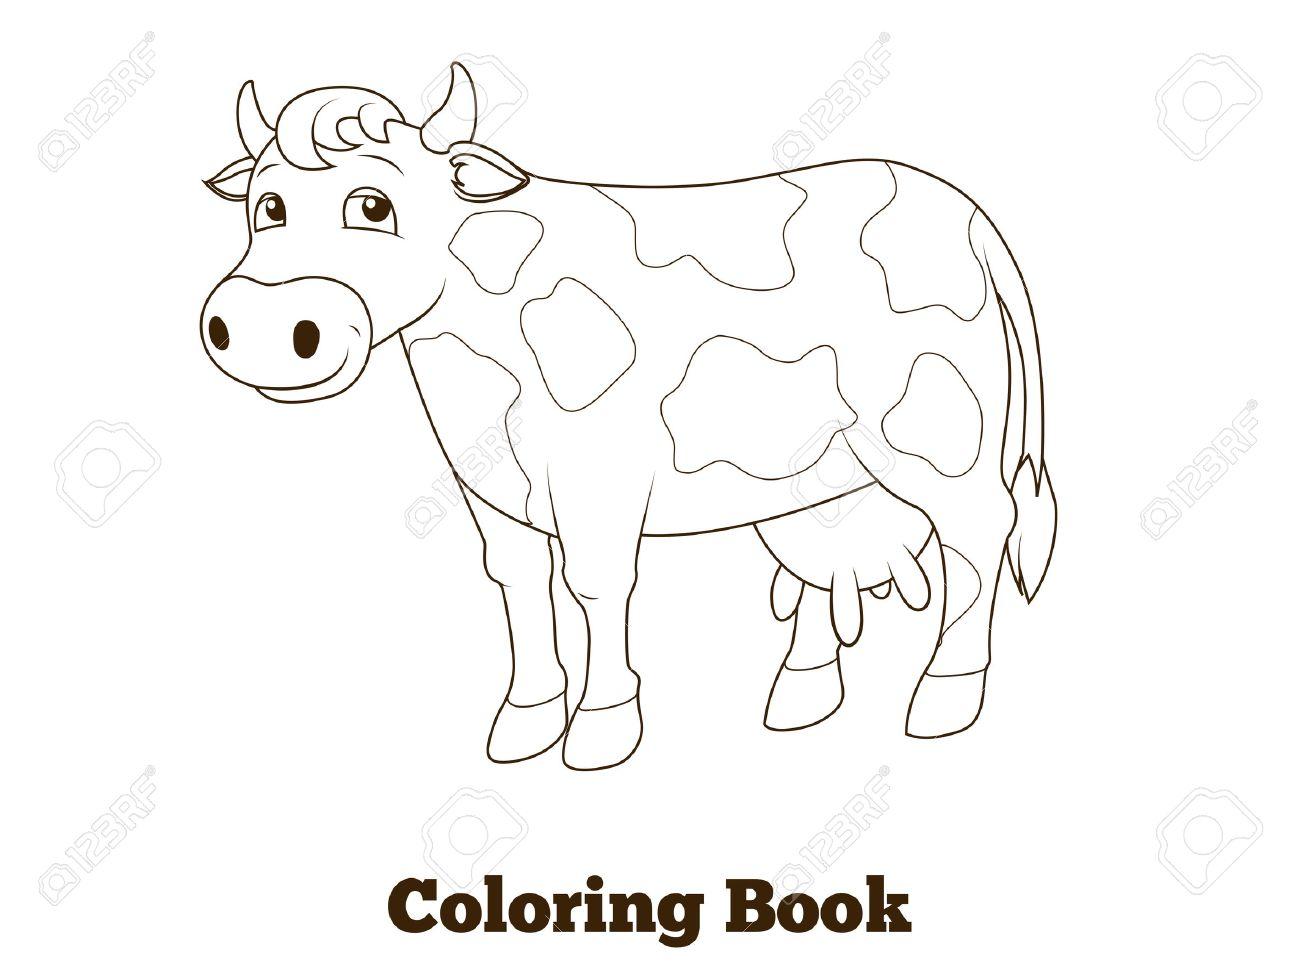 Coloring Book Cow Cartoon Educational Vector Illustration Royalty